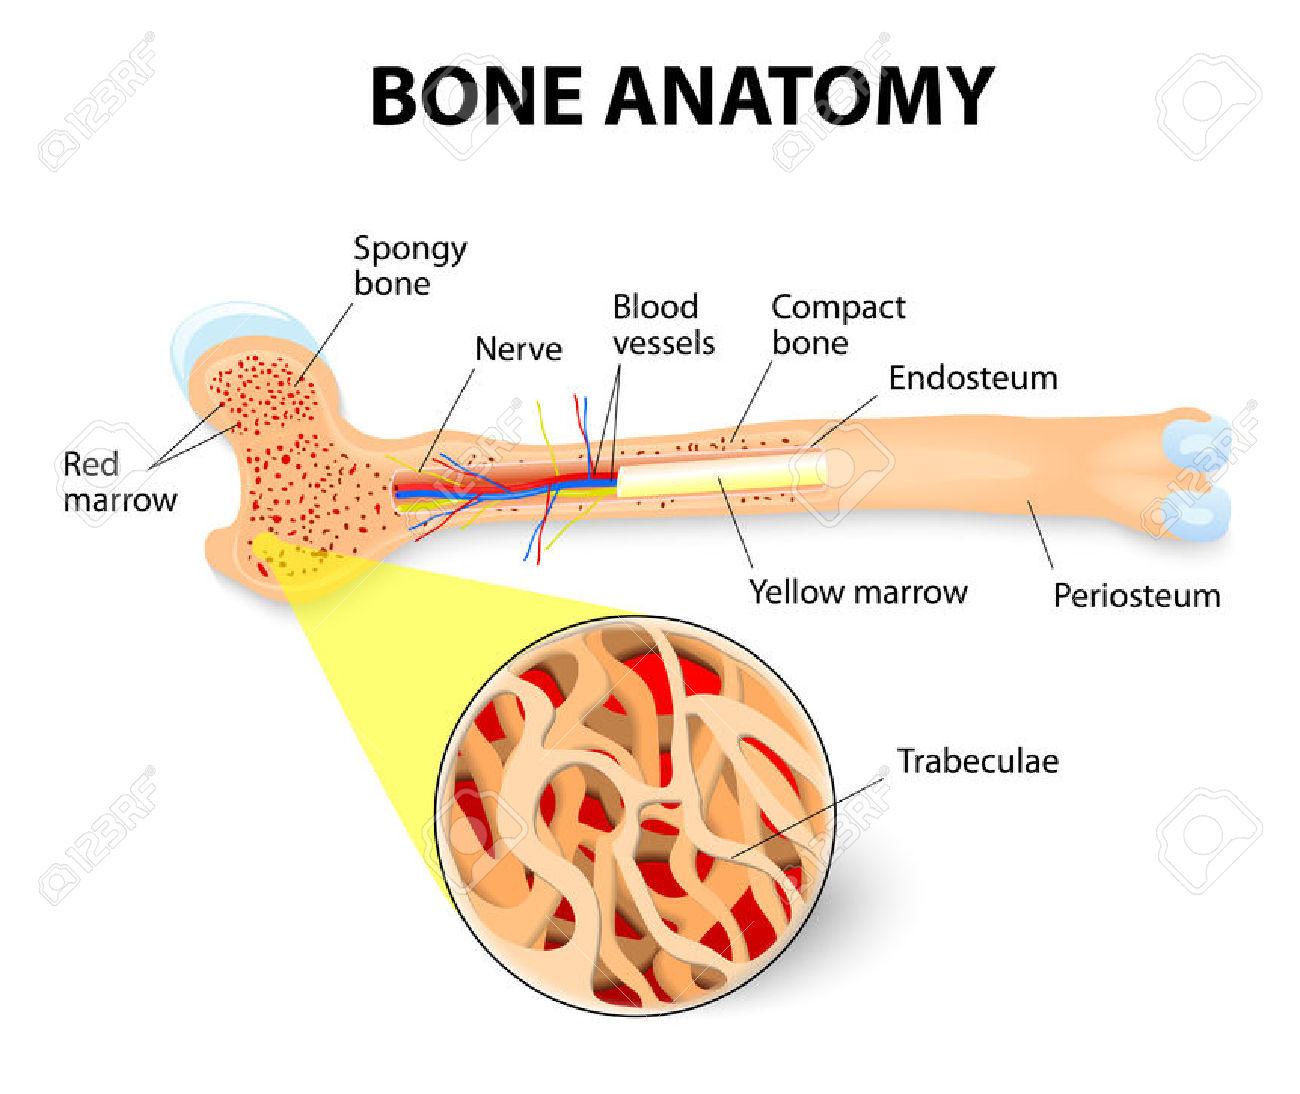 Anatomy Of The Long Bone. Periosteum, Endosteum, Bone Marrow.